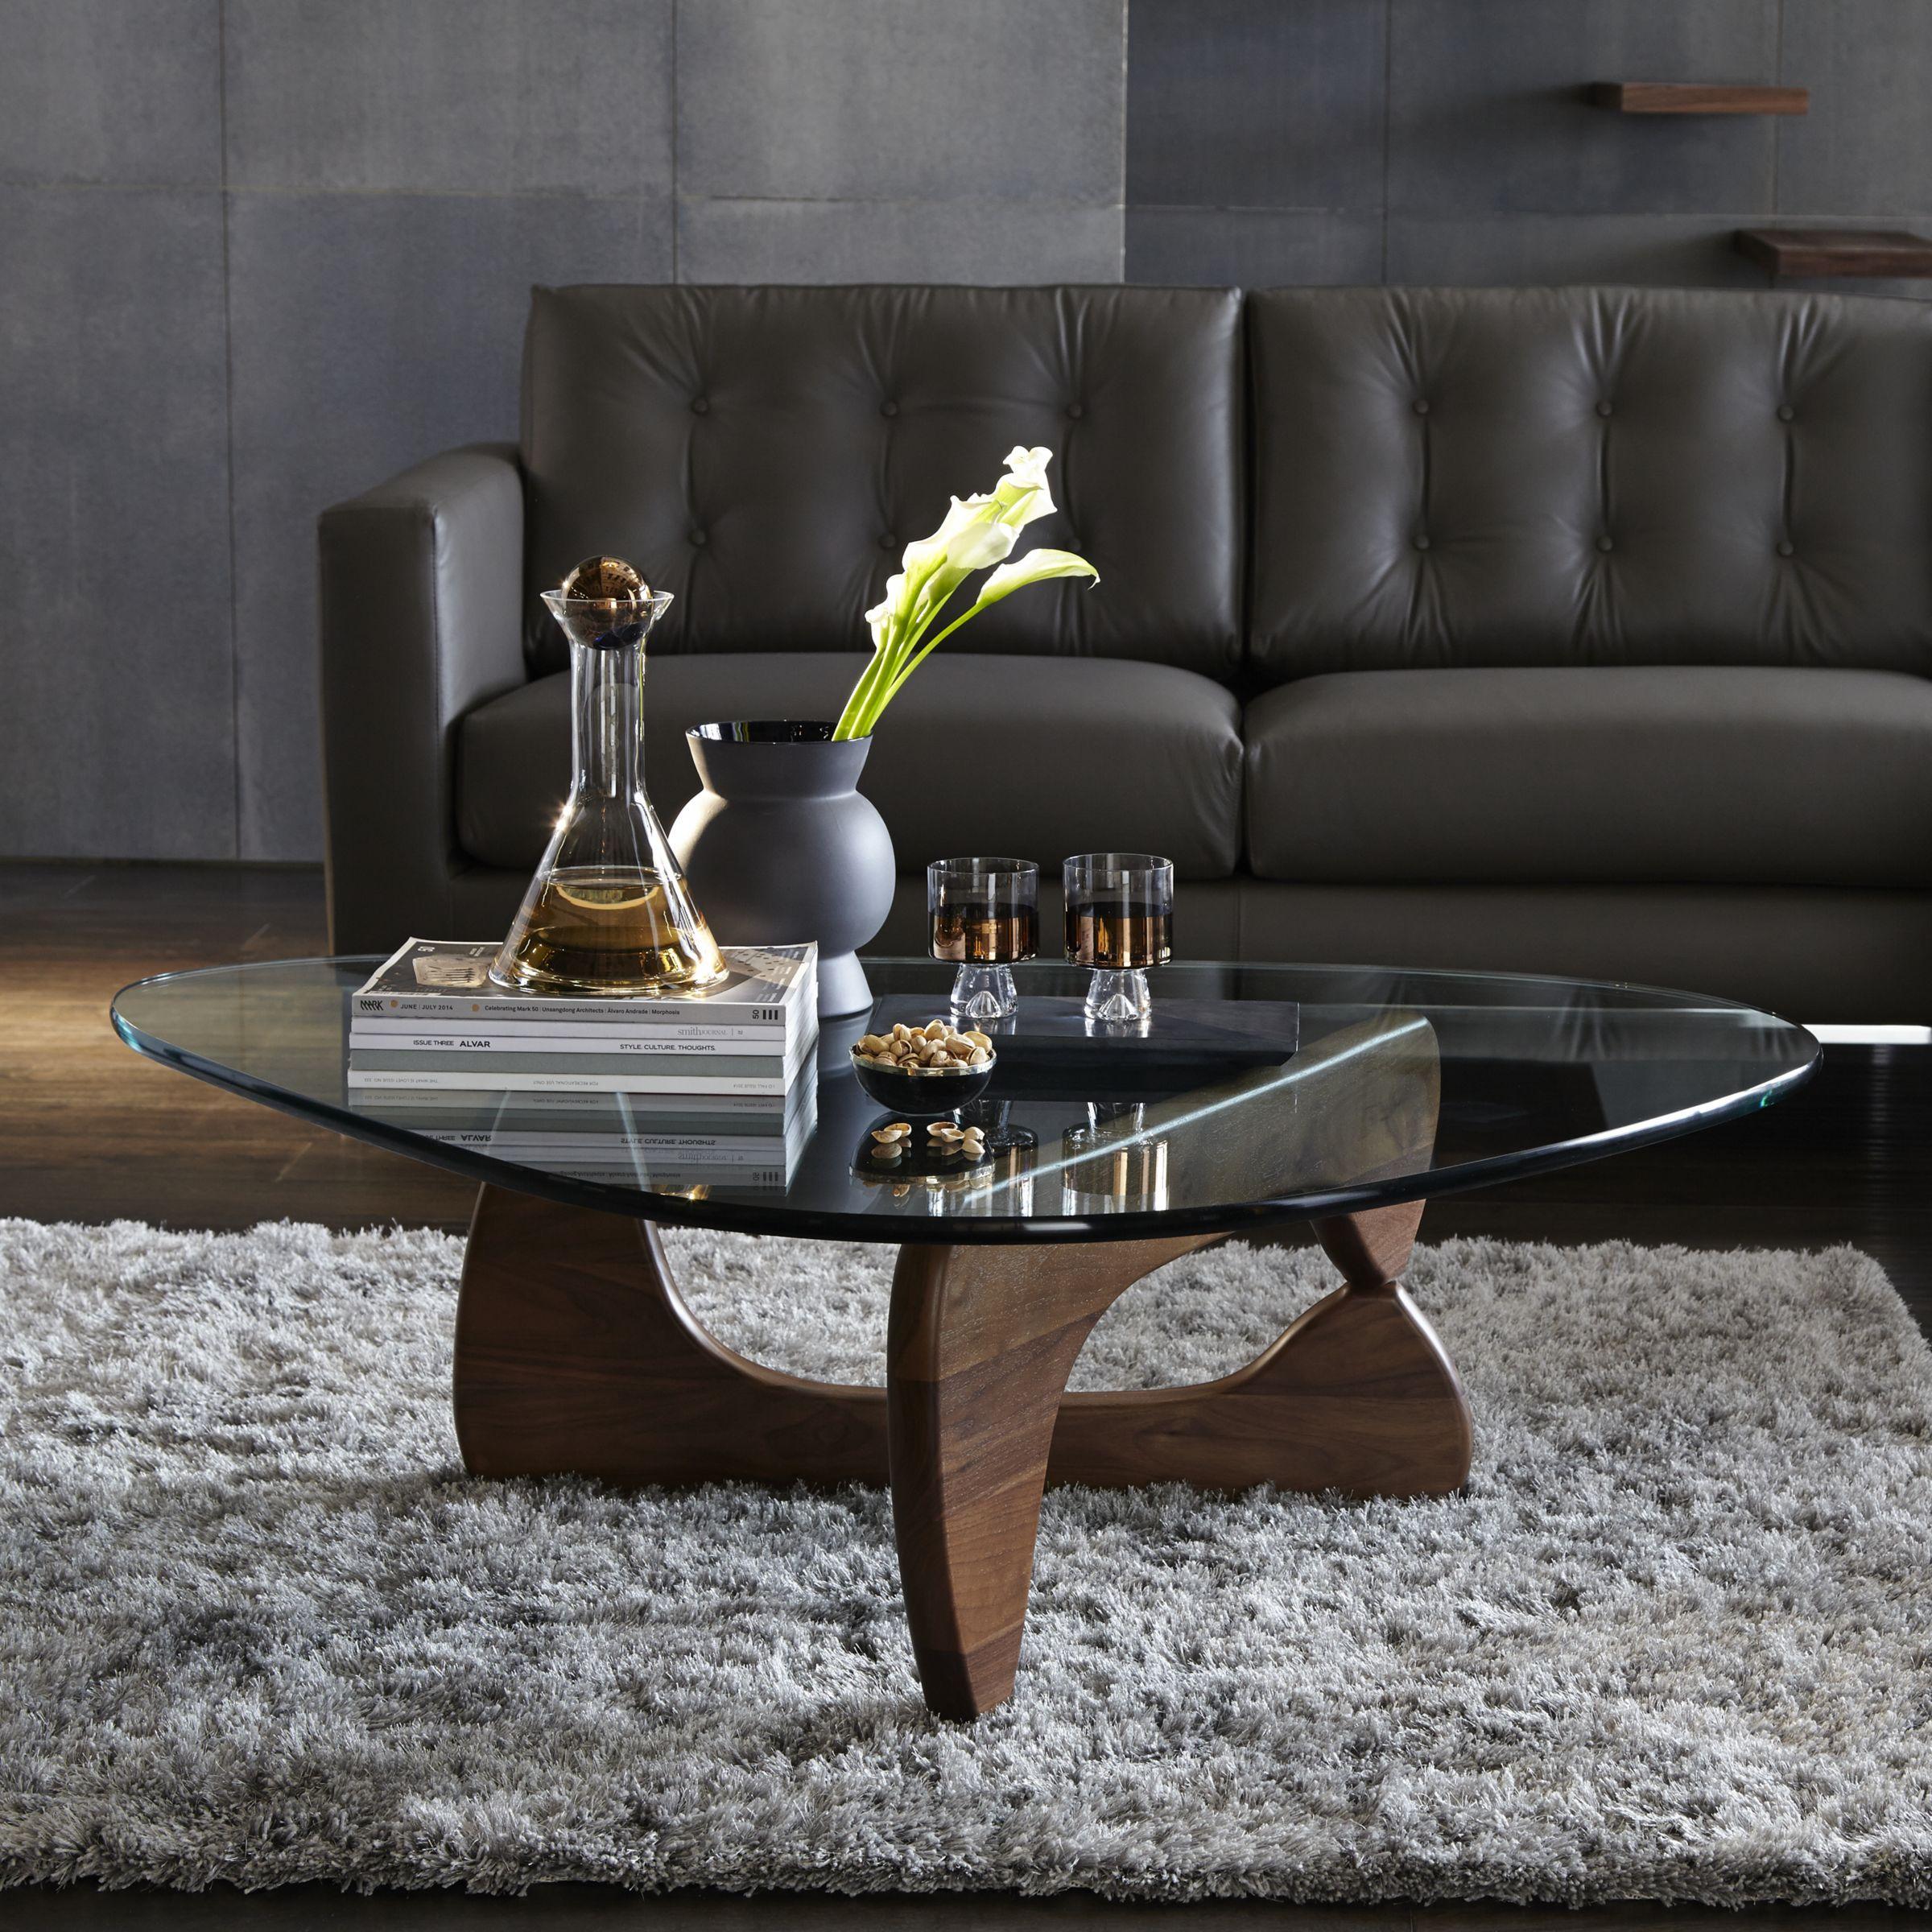 Vitra Noguchi Coffee Table Walnut In 2020 Noguchi Coffee Table